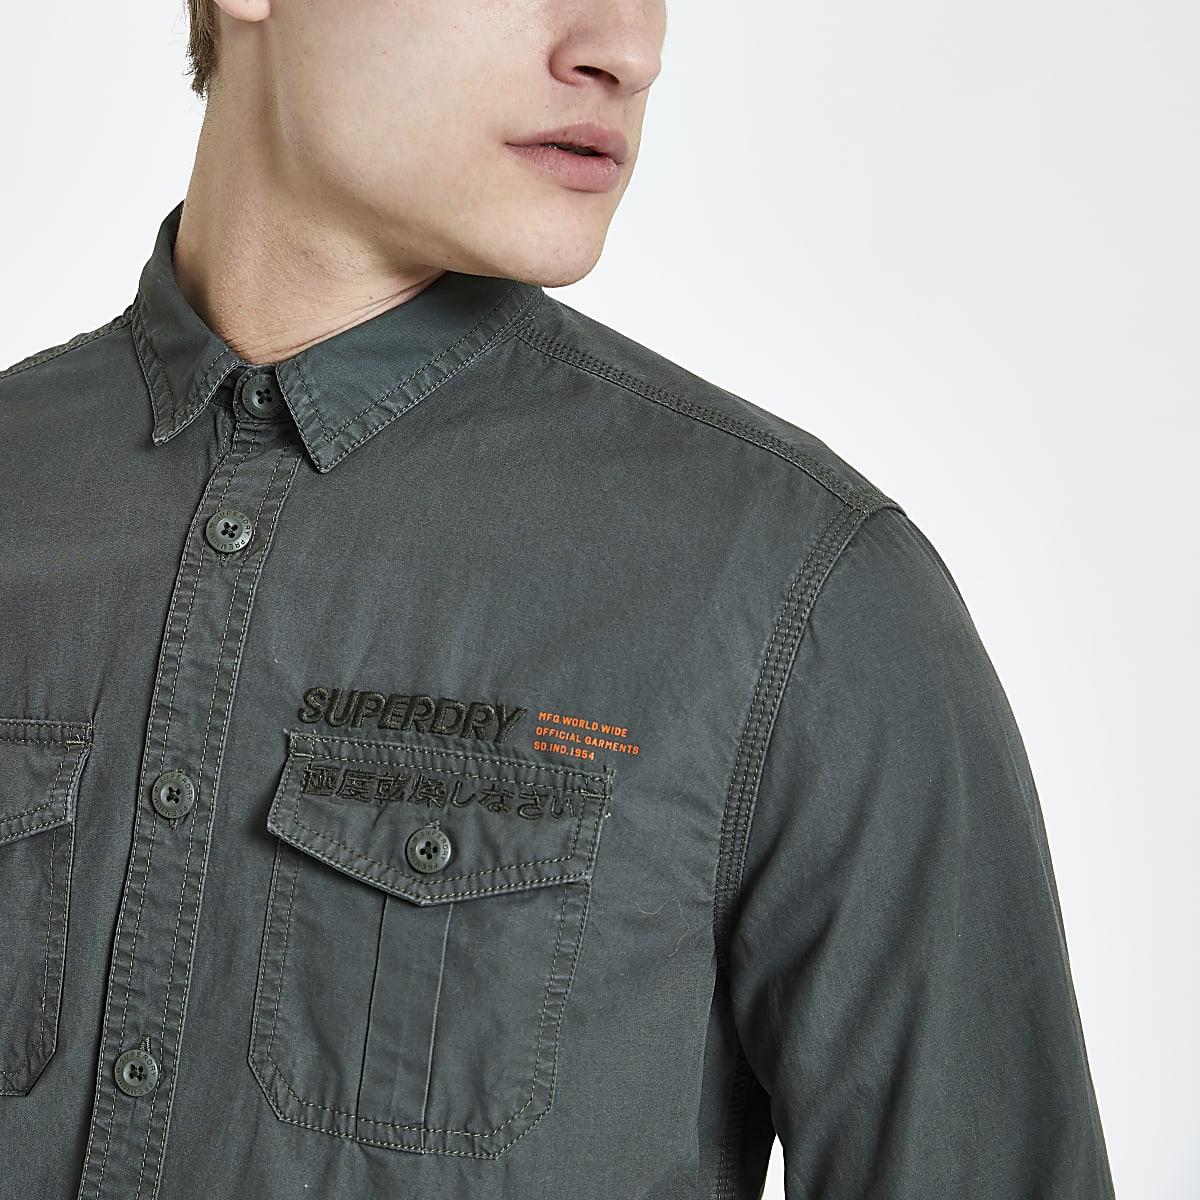 Superdry – Dunkelgrünes Langarmhemd